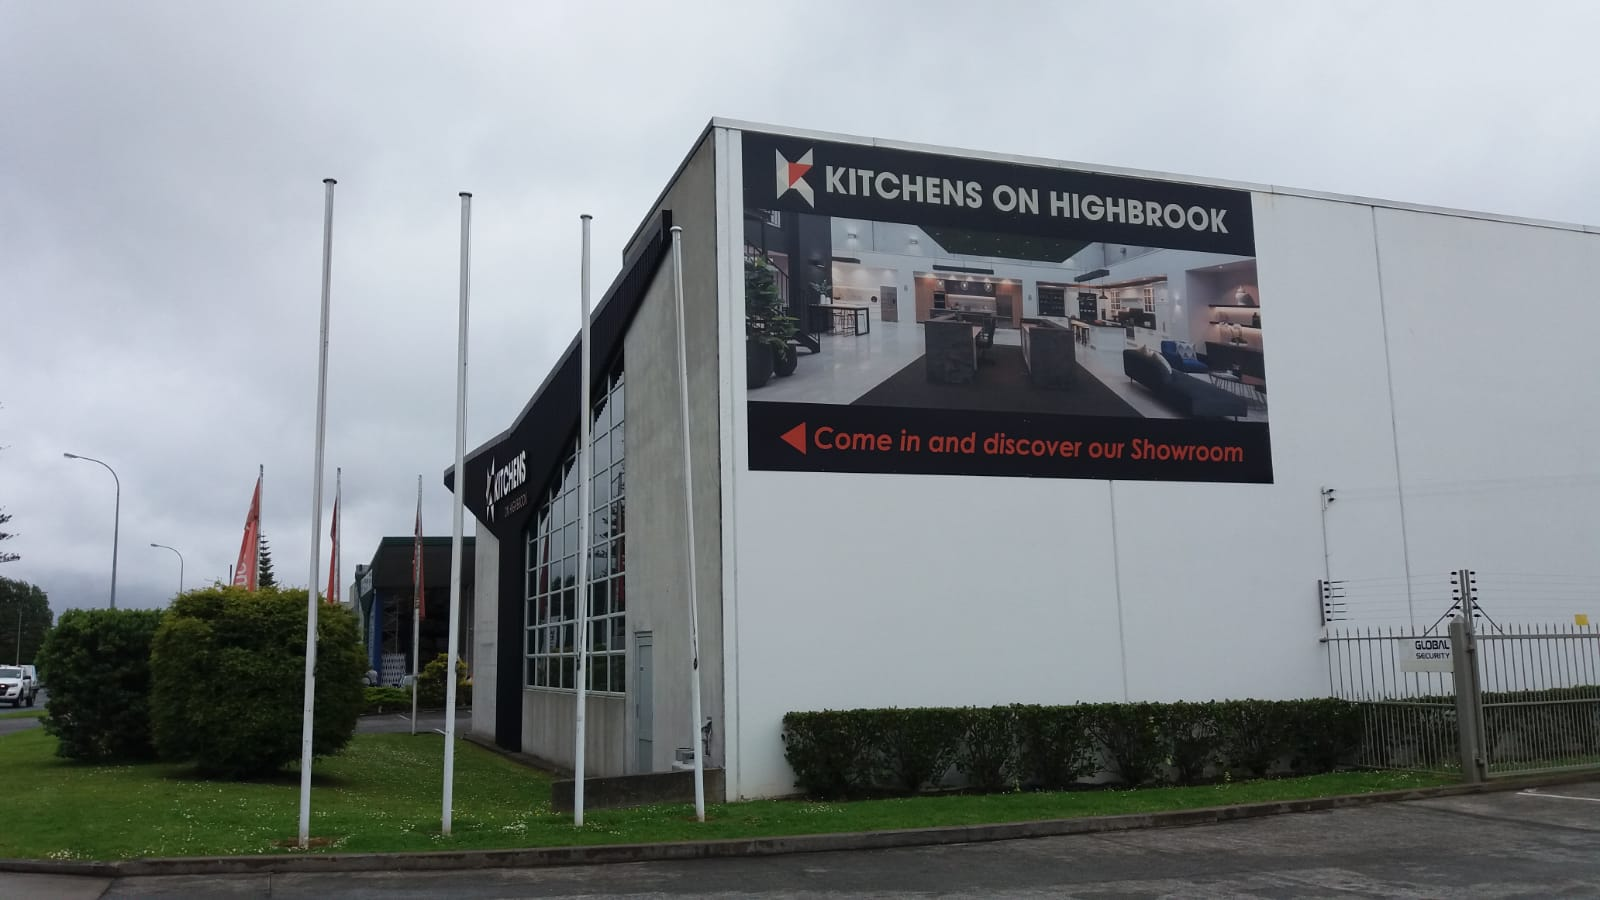 Kitchens on Highbrook